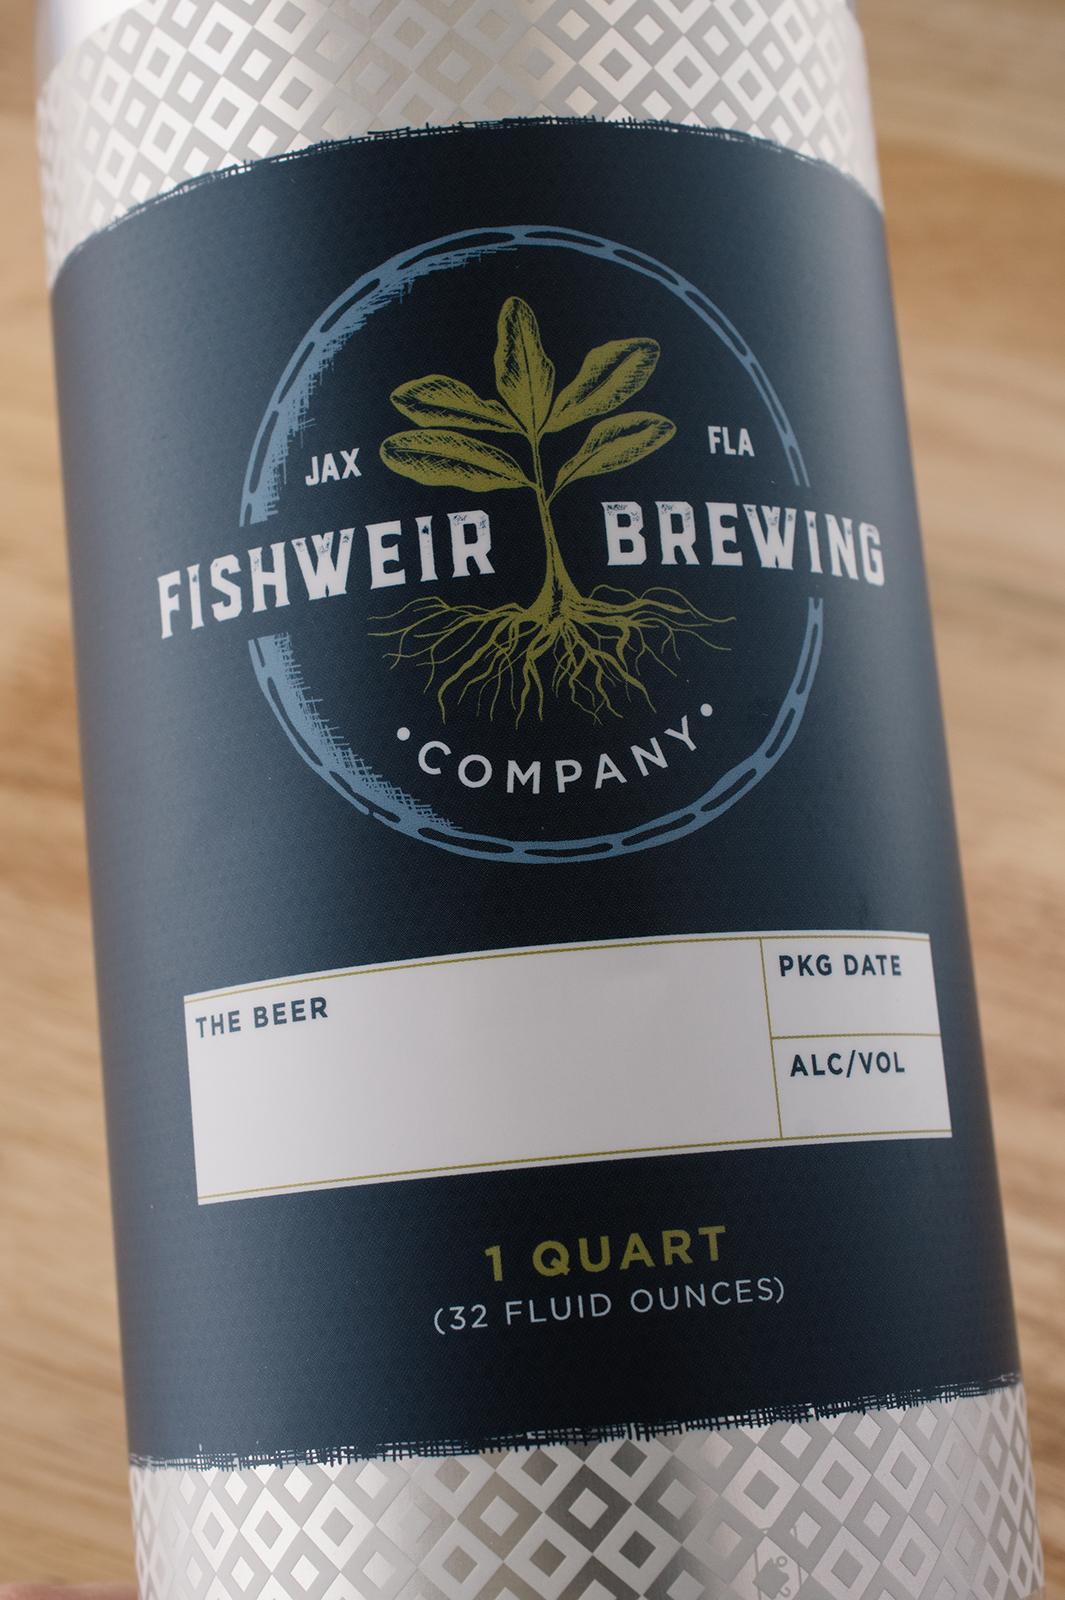 fishweir brewing company craft beer crowler label design cedar rapids iowa graphic designer